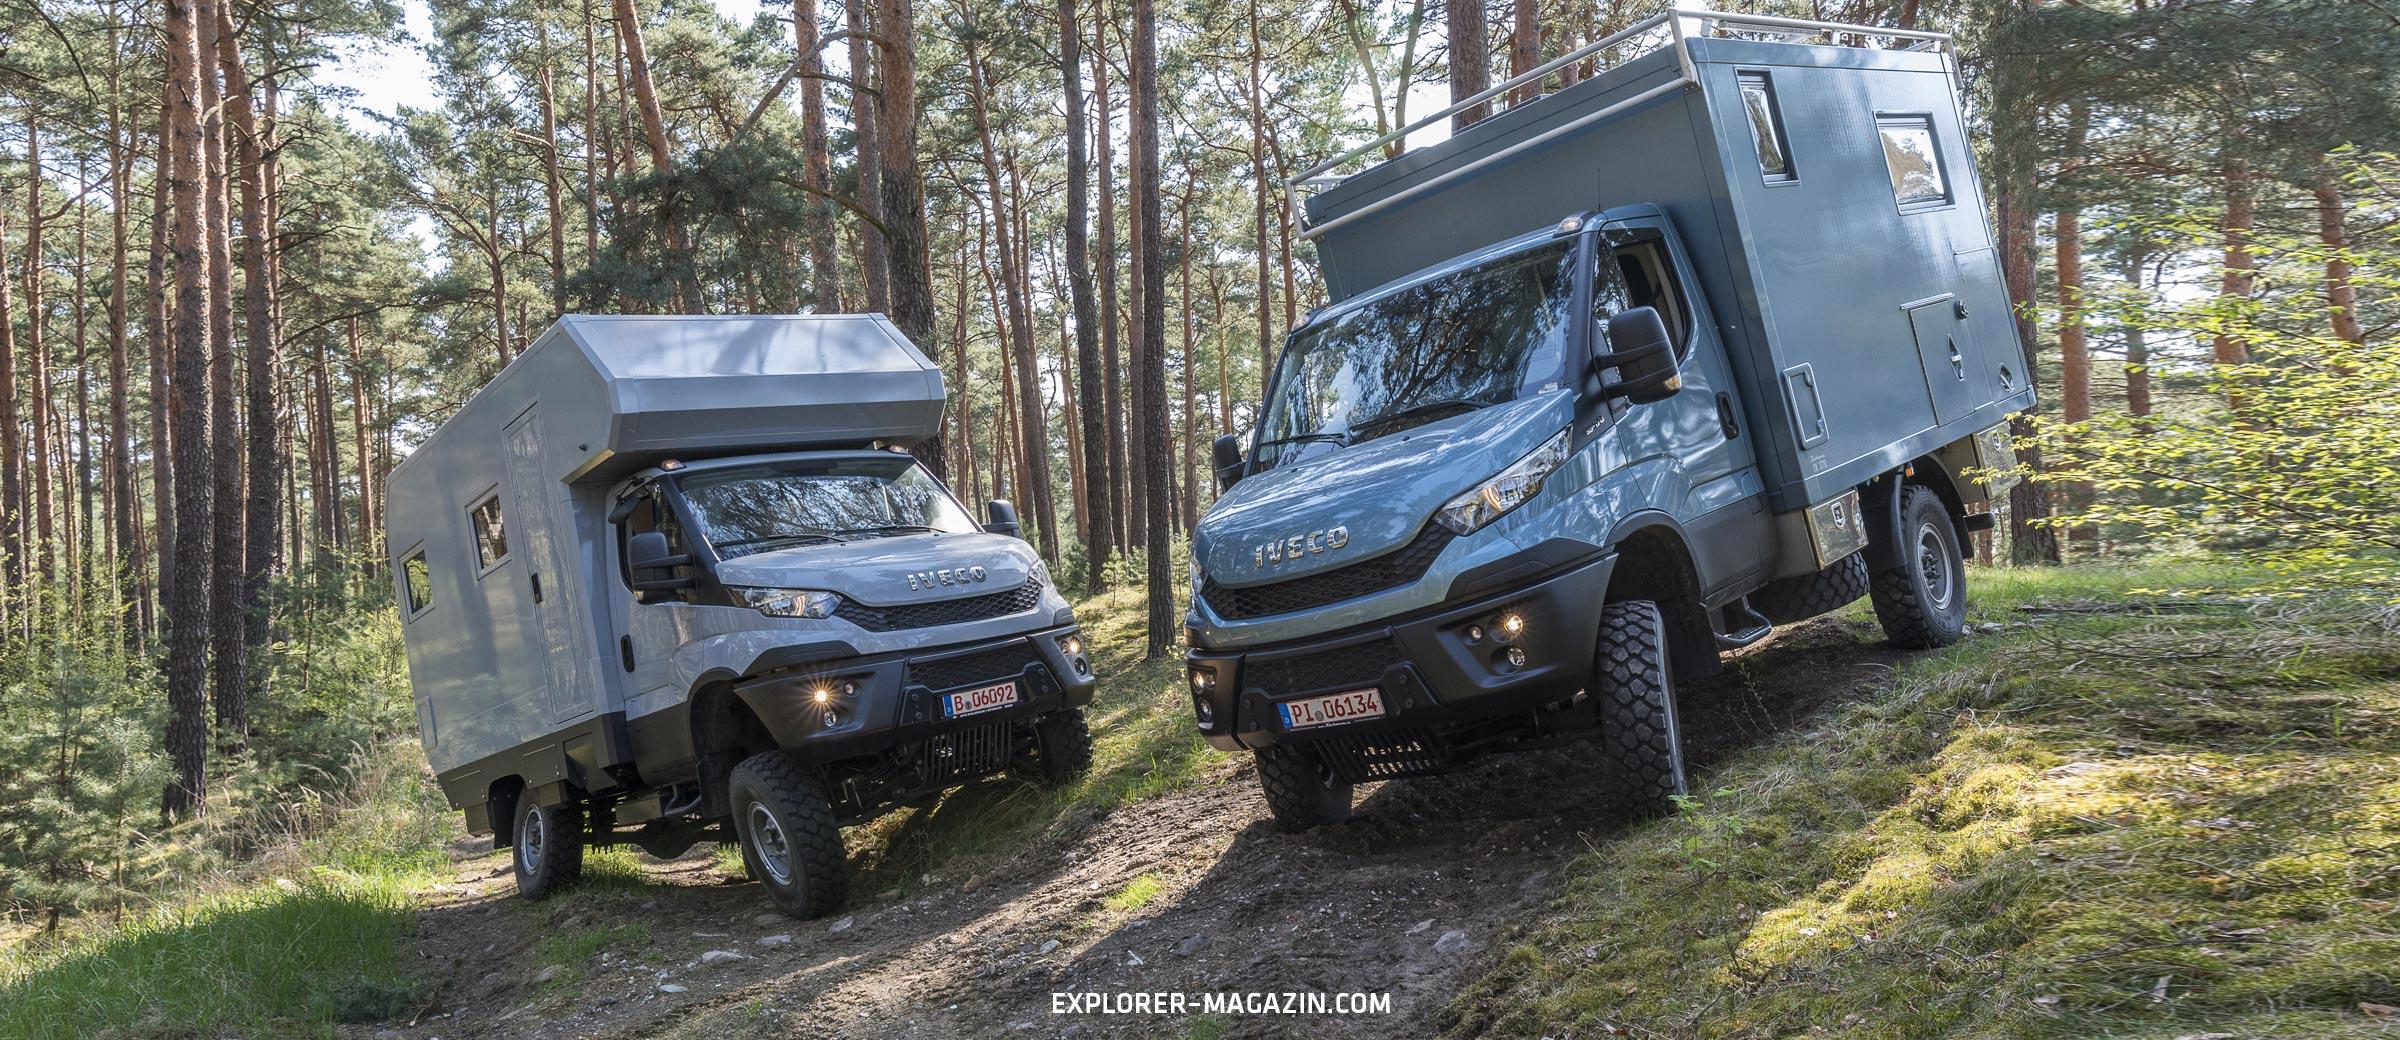 Kompakt & Klasse: Iveco Daily Allrad-Wohnmobil im Vergleichstest